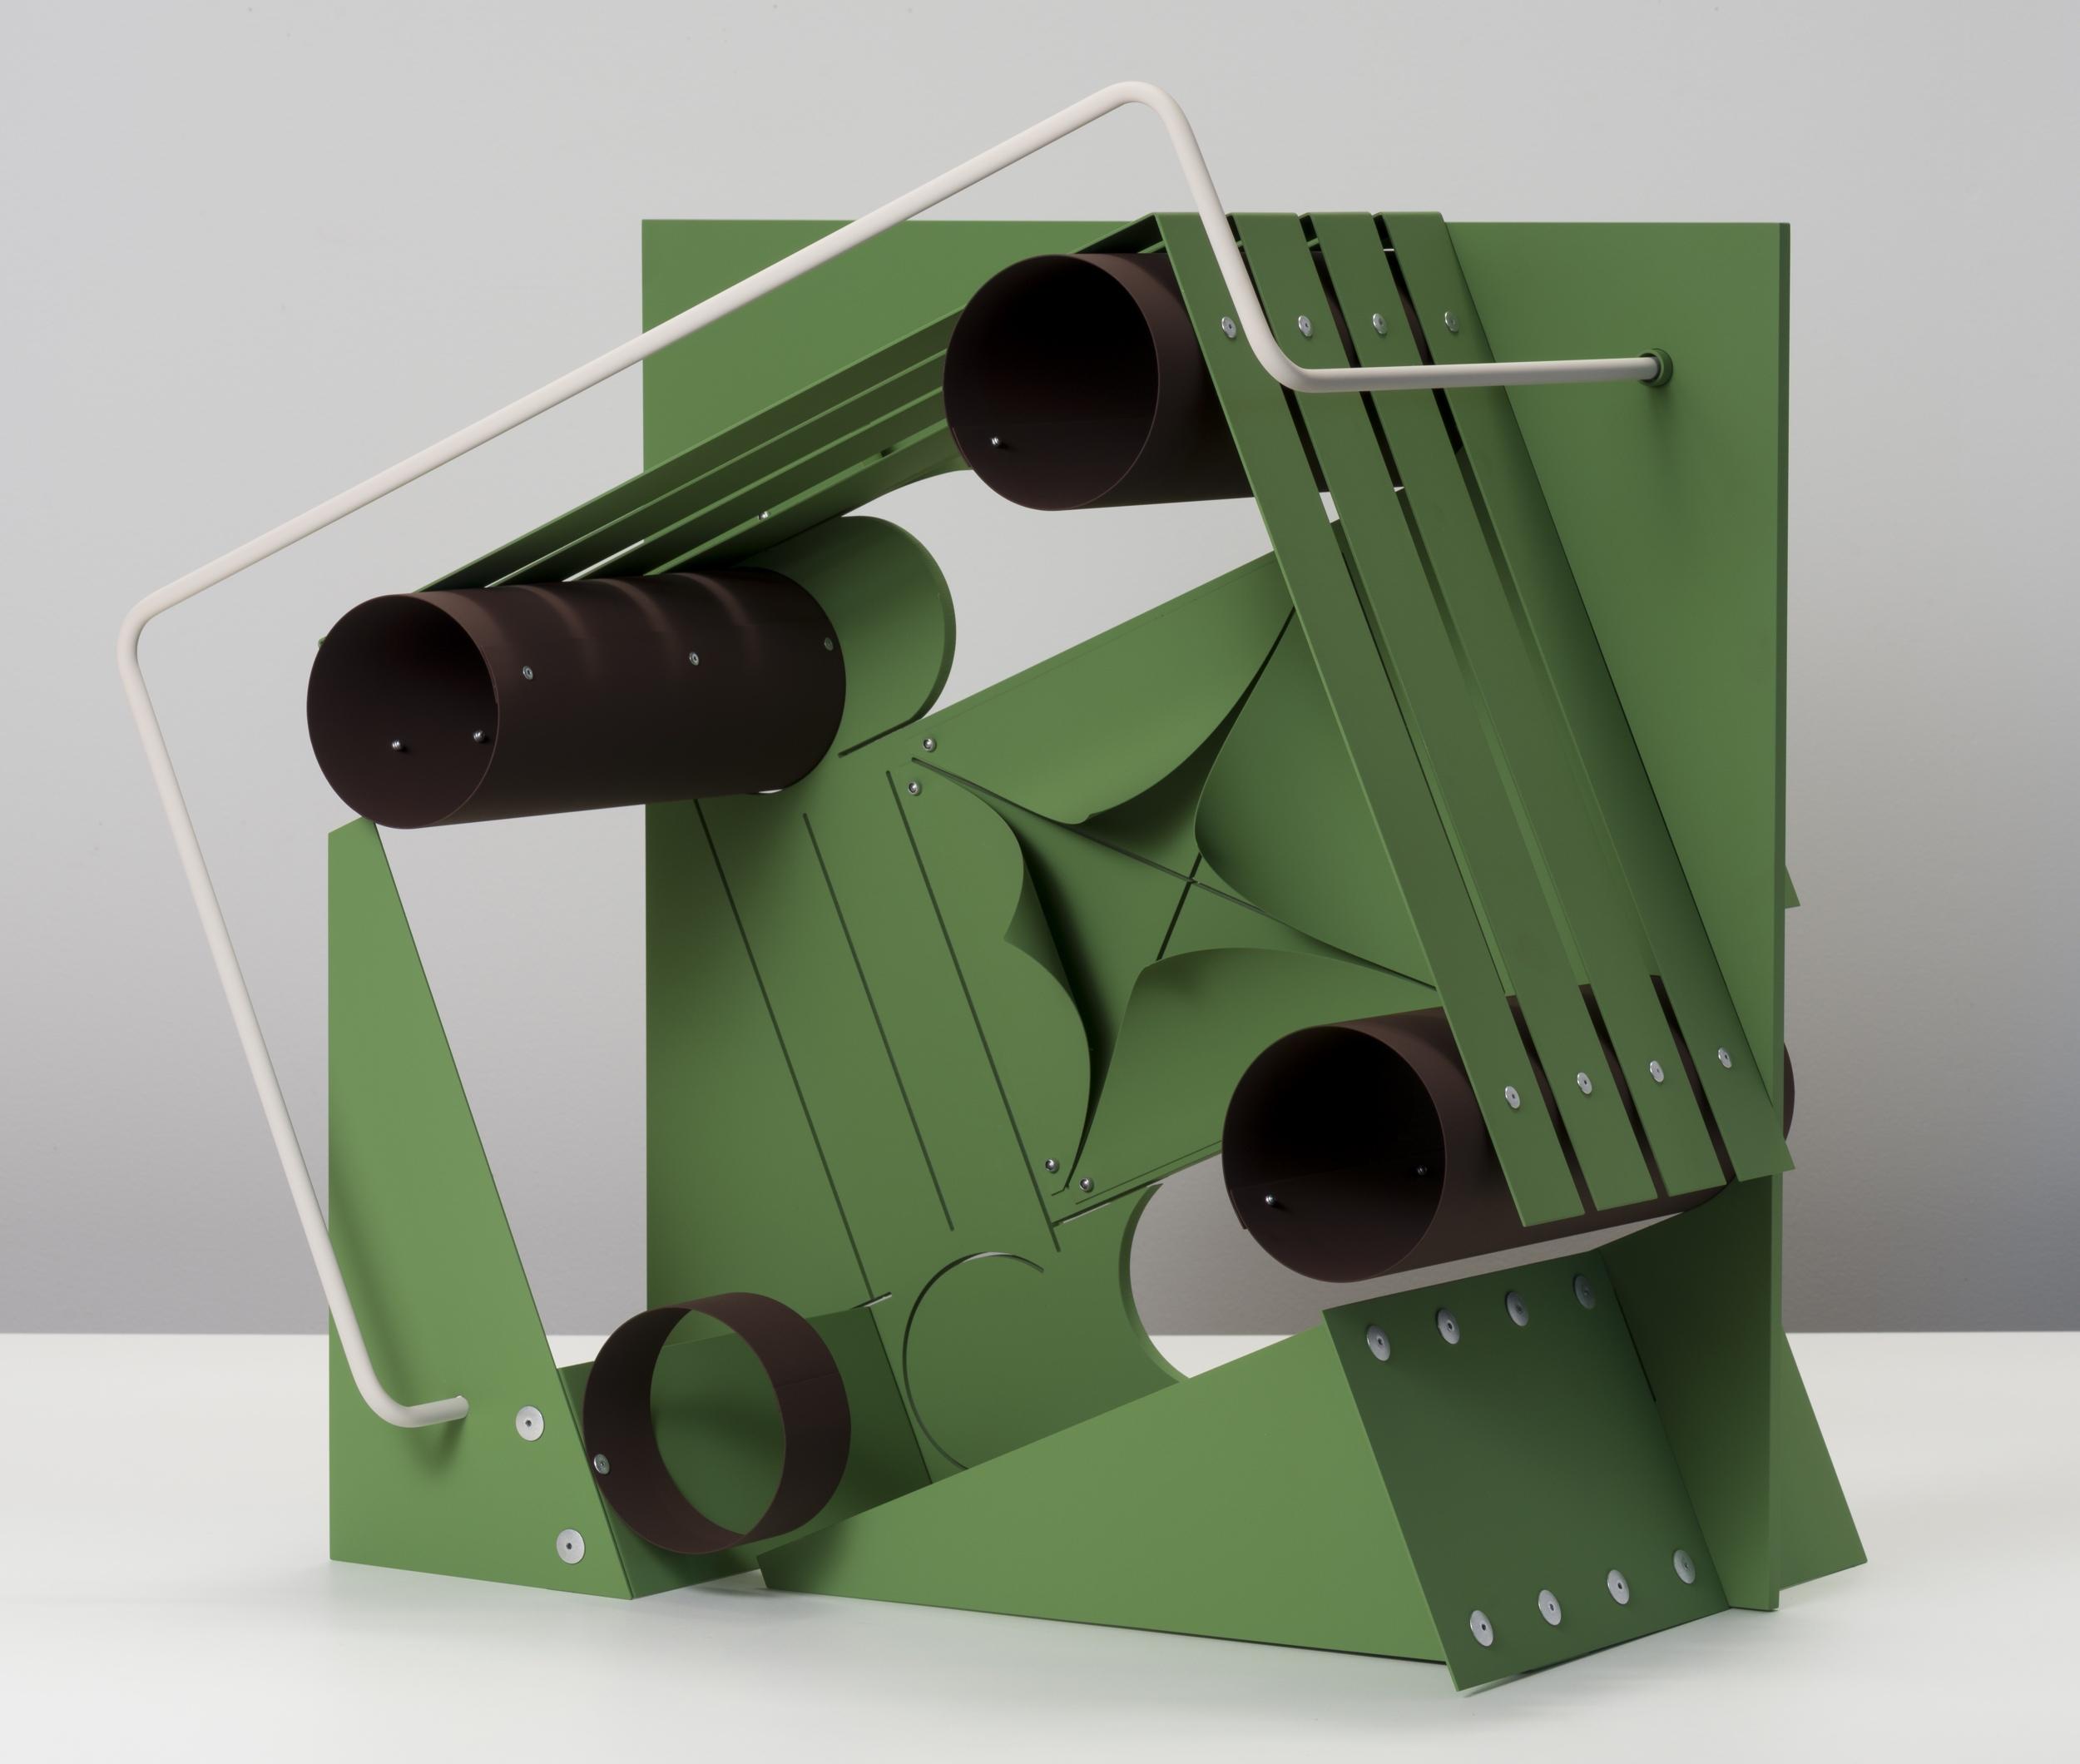 Matt Paweski, untitled   (Machines - oxide green, brown, rose), 2018, aluminum, aluminum rivets, vinyl paint, 26.5 x 24.5 x 17.5 inches (67.3 x 62.2 x 44.5 cm)